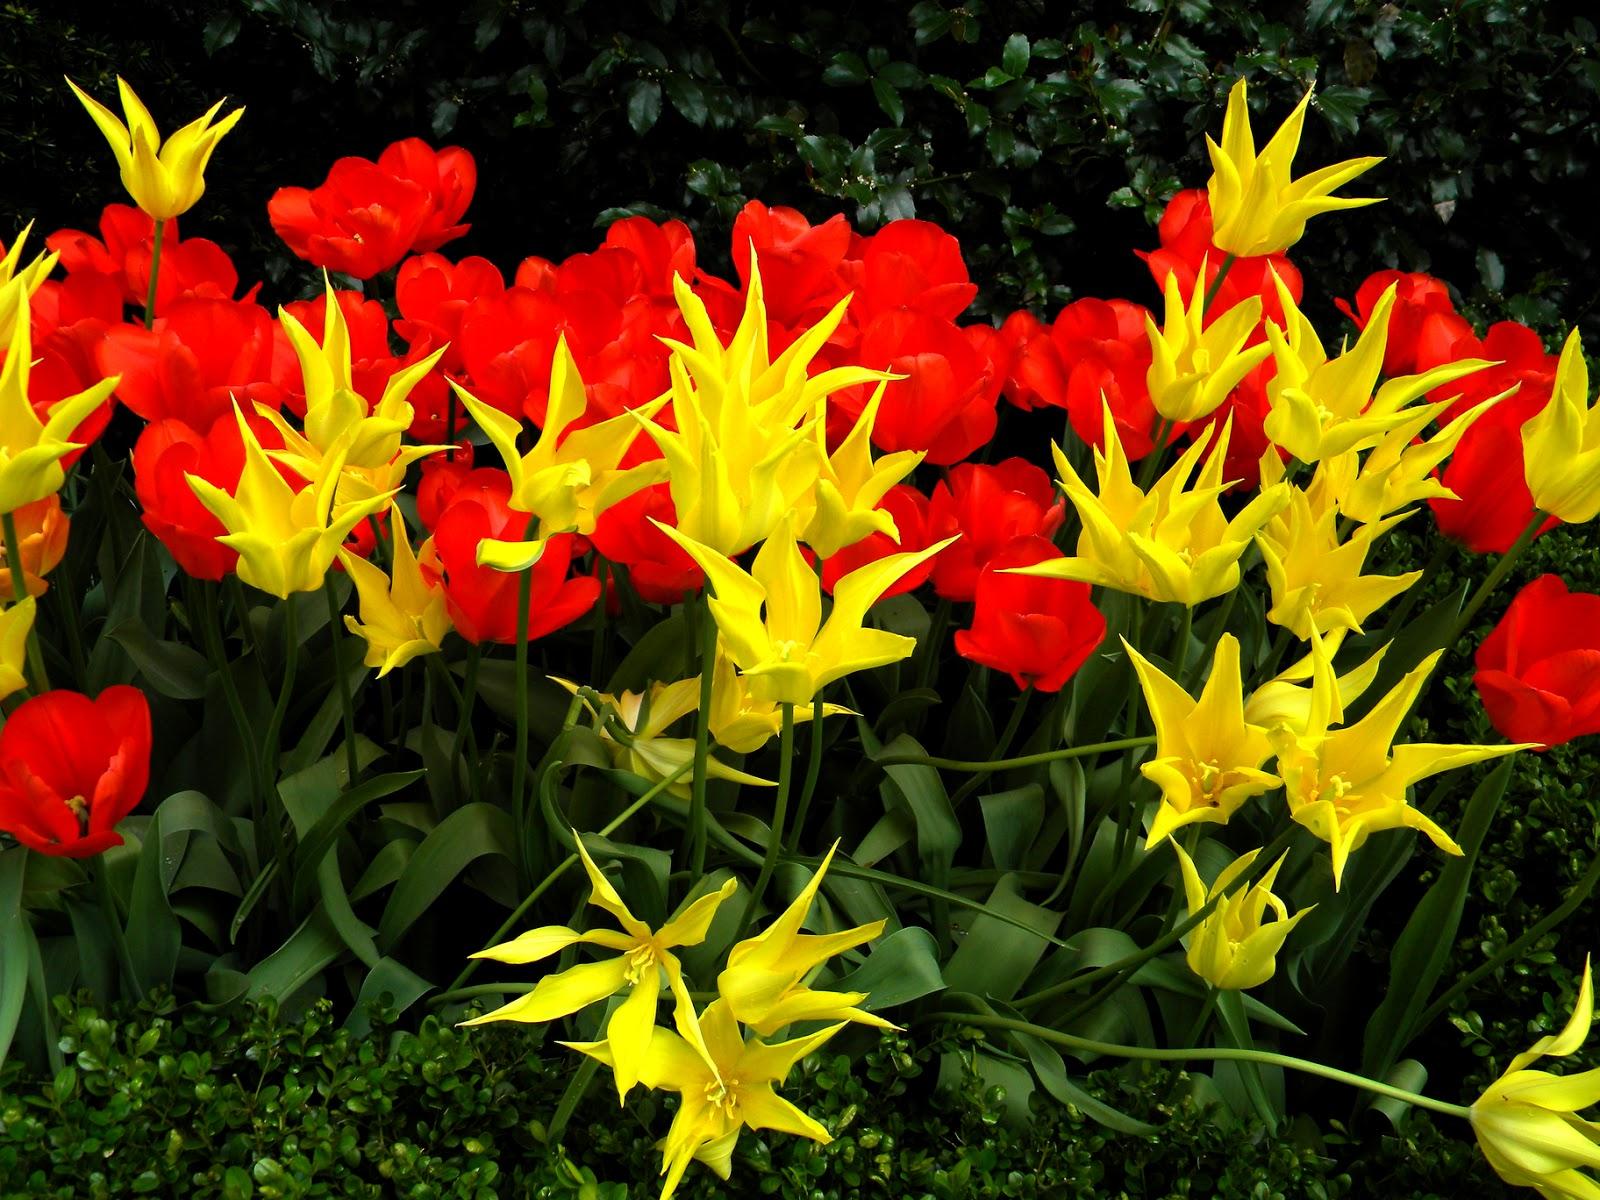 Orange Yellow and Red Tulips